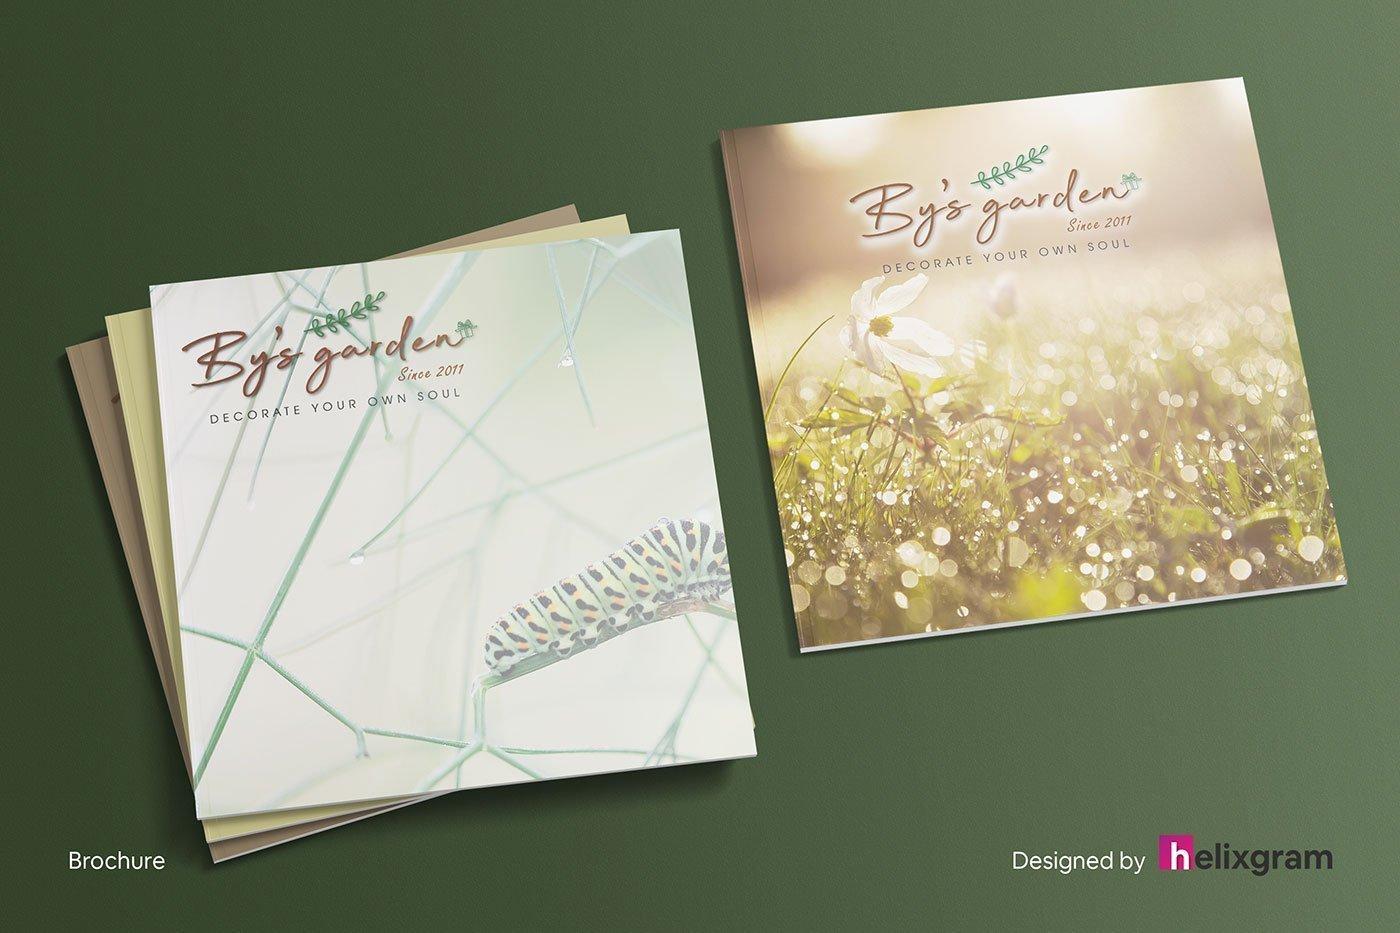 Brand-Identity-Design-Brochure-Catalogs-By's-Garden-visual-identity-design-package-corporate-identity-design-logo-design-flyer-poster-book-cover-design-web-design-digital-advertising-design-Helixgram